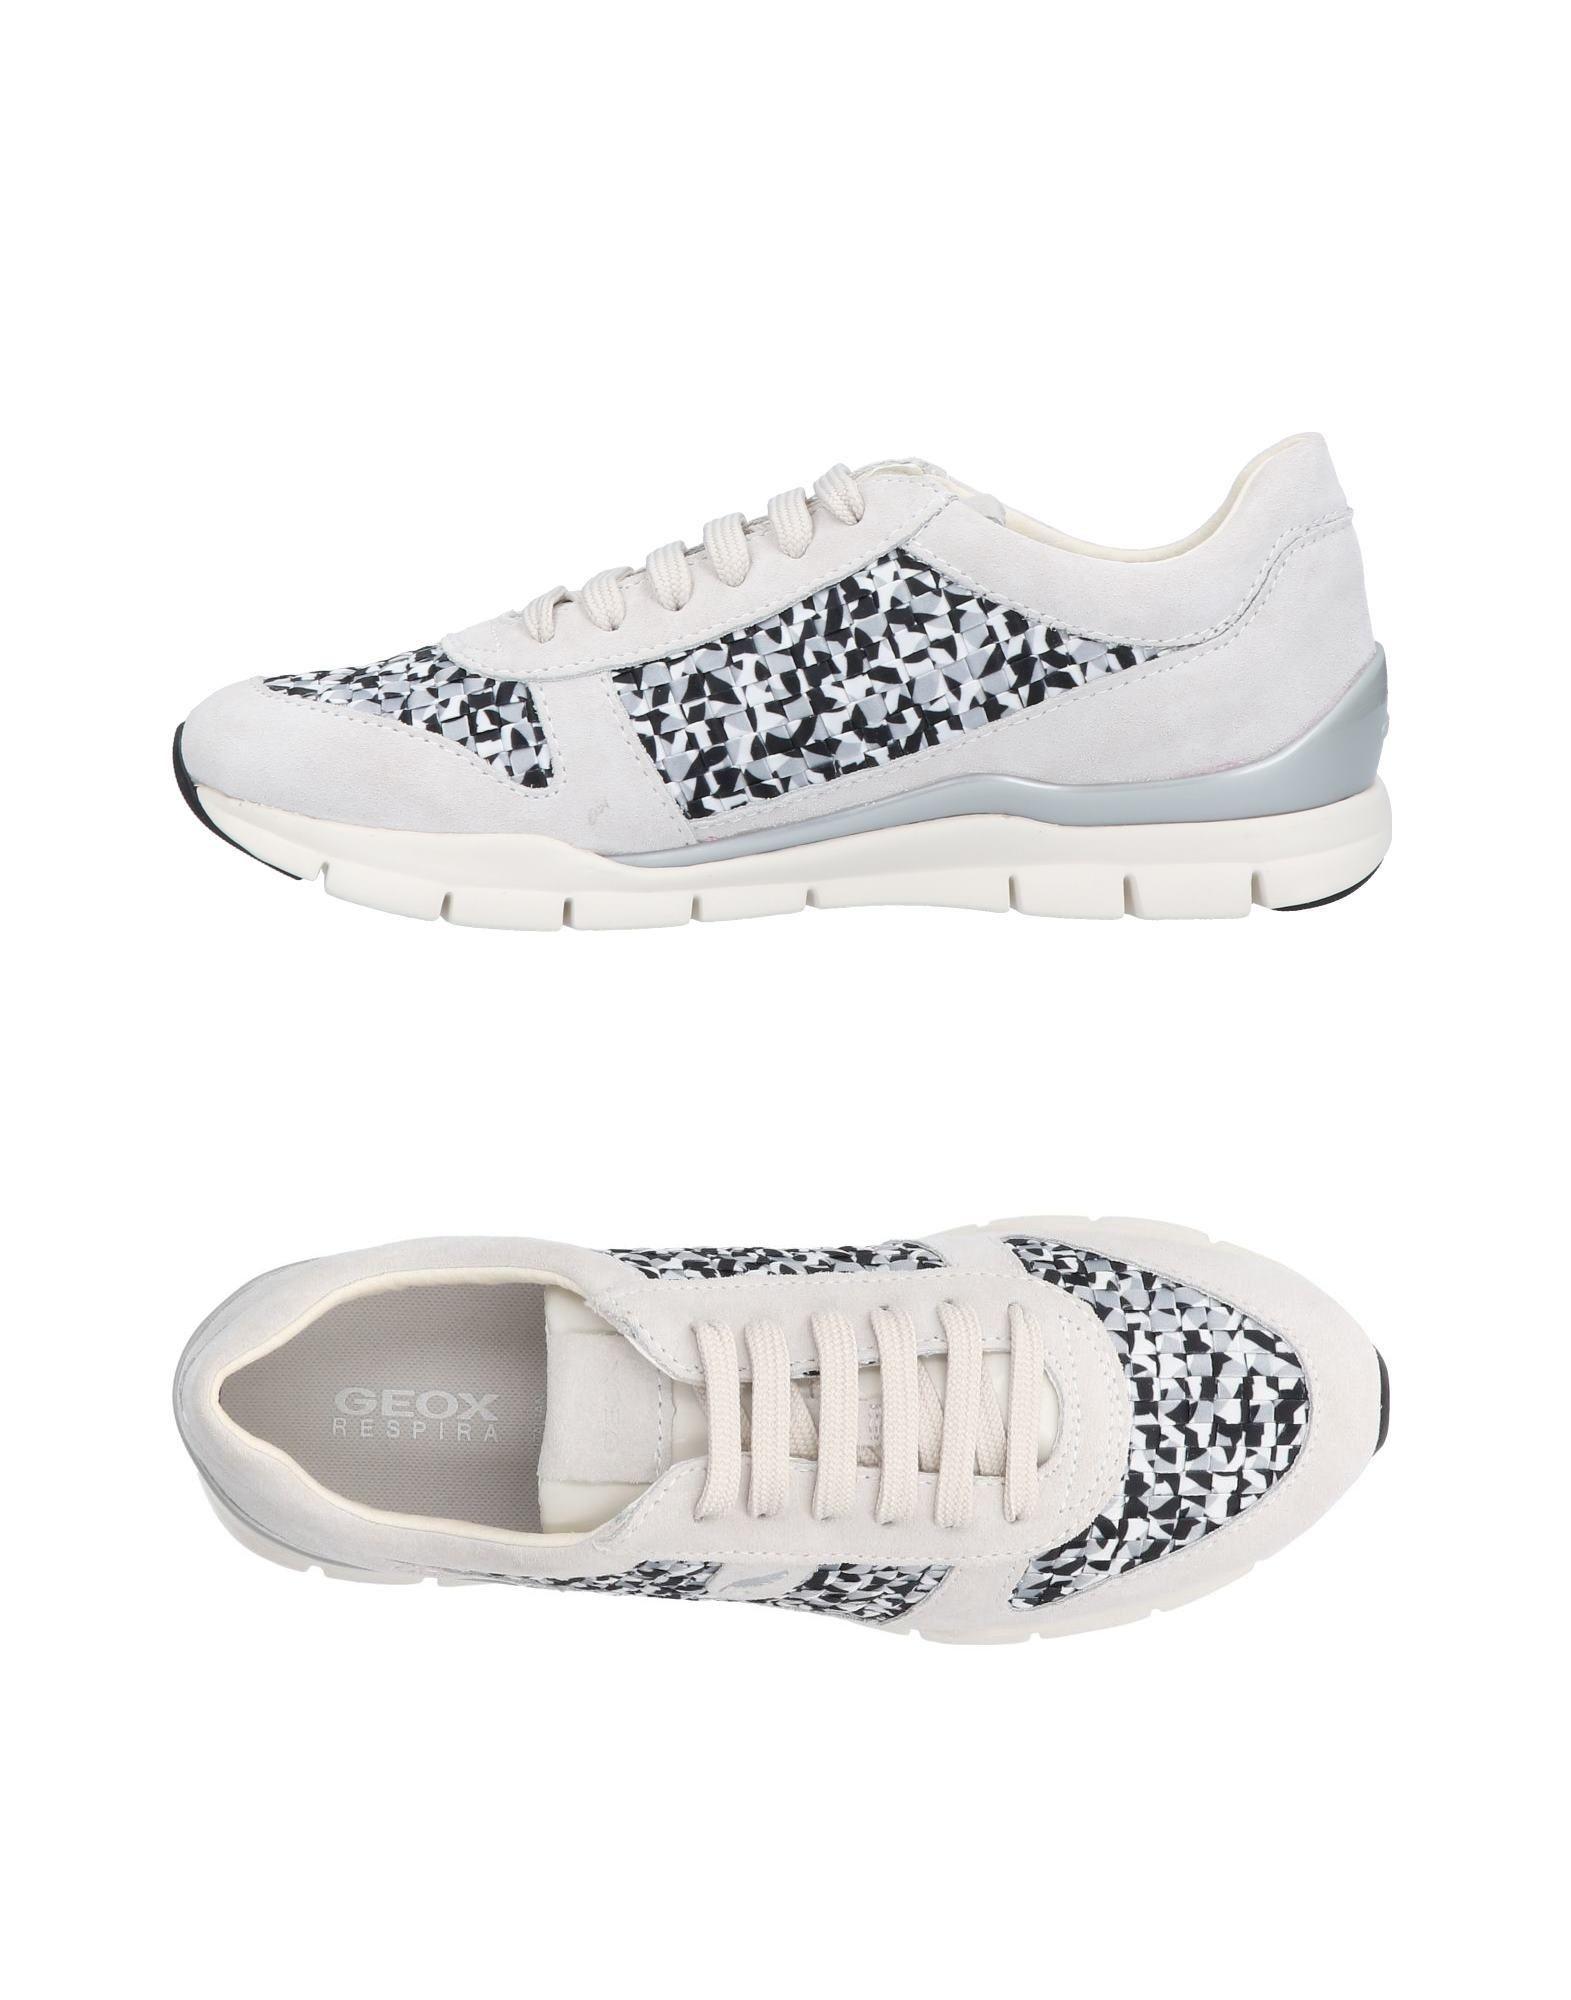 Haltbare Mode billige Schuhe Geox Sneakers Damen  11453360NT Heiße Schuhe